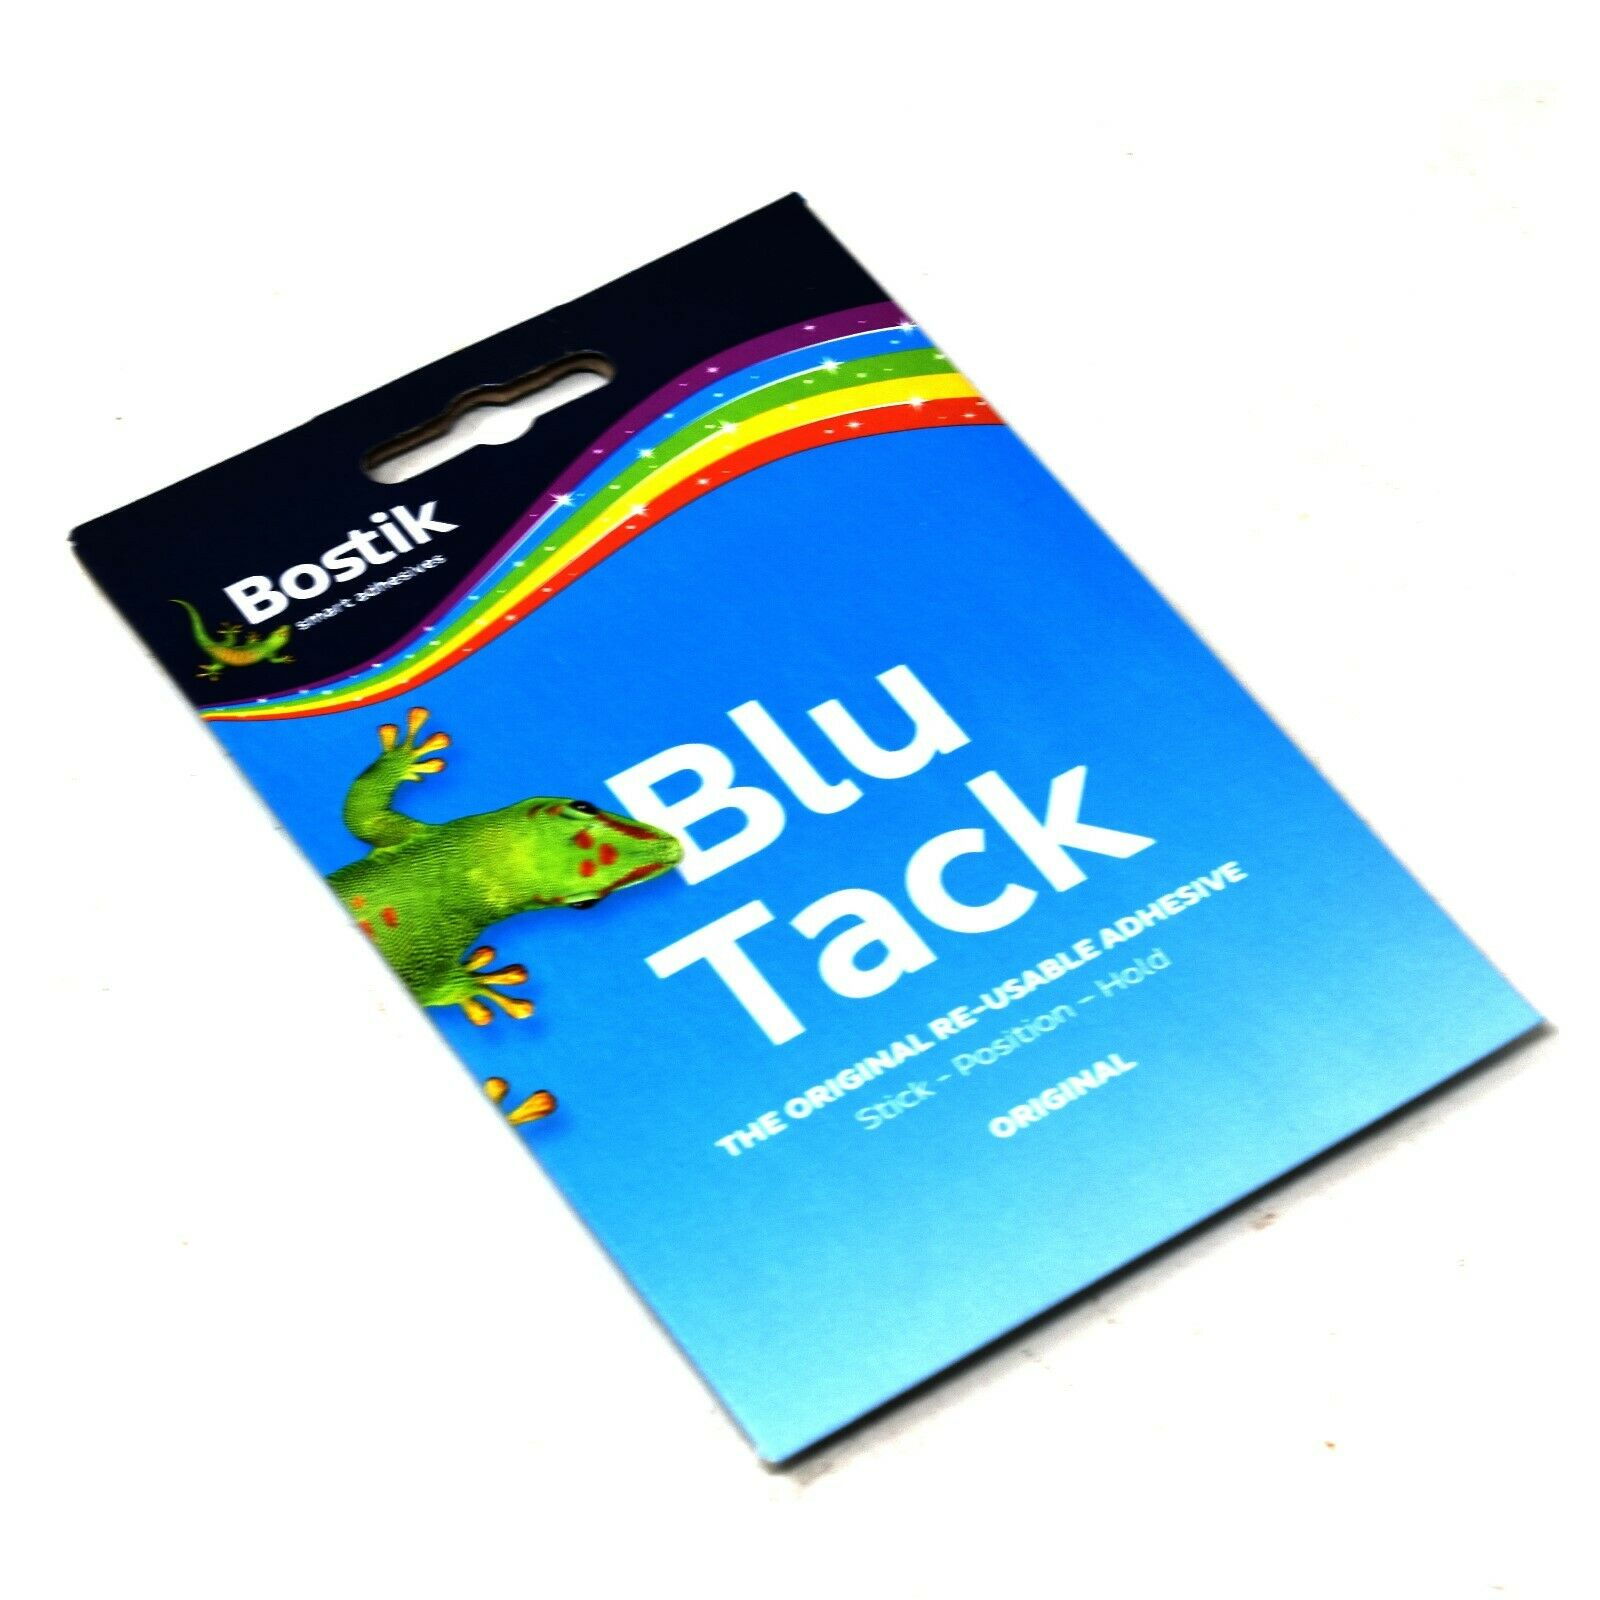 BOSTIK BLU TACK HANDY REUSABLE ORIGINAL BLUE STICKY ADHESIVE ECONOMY PACK